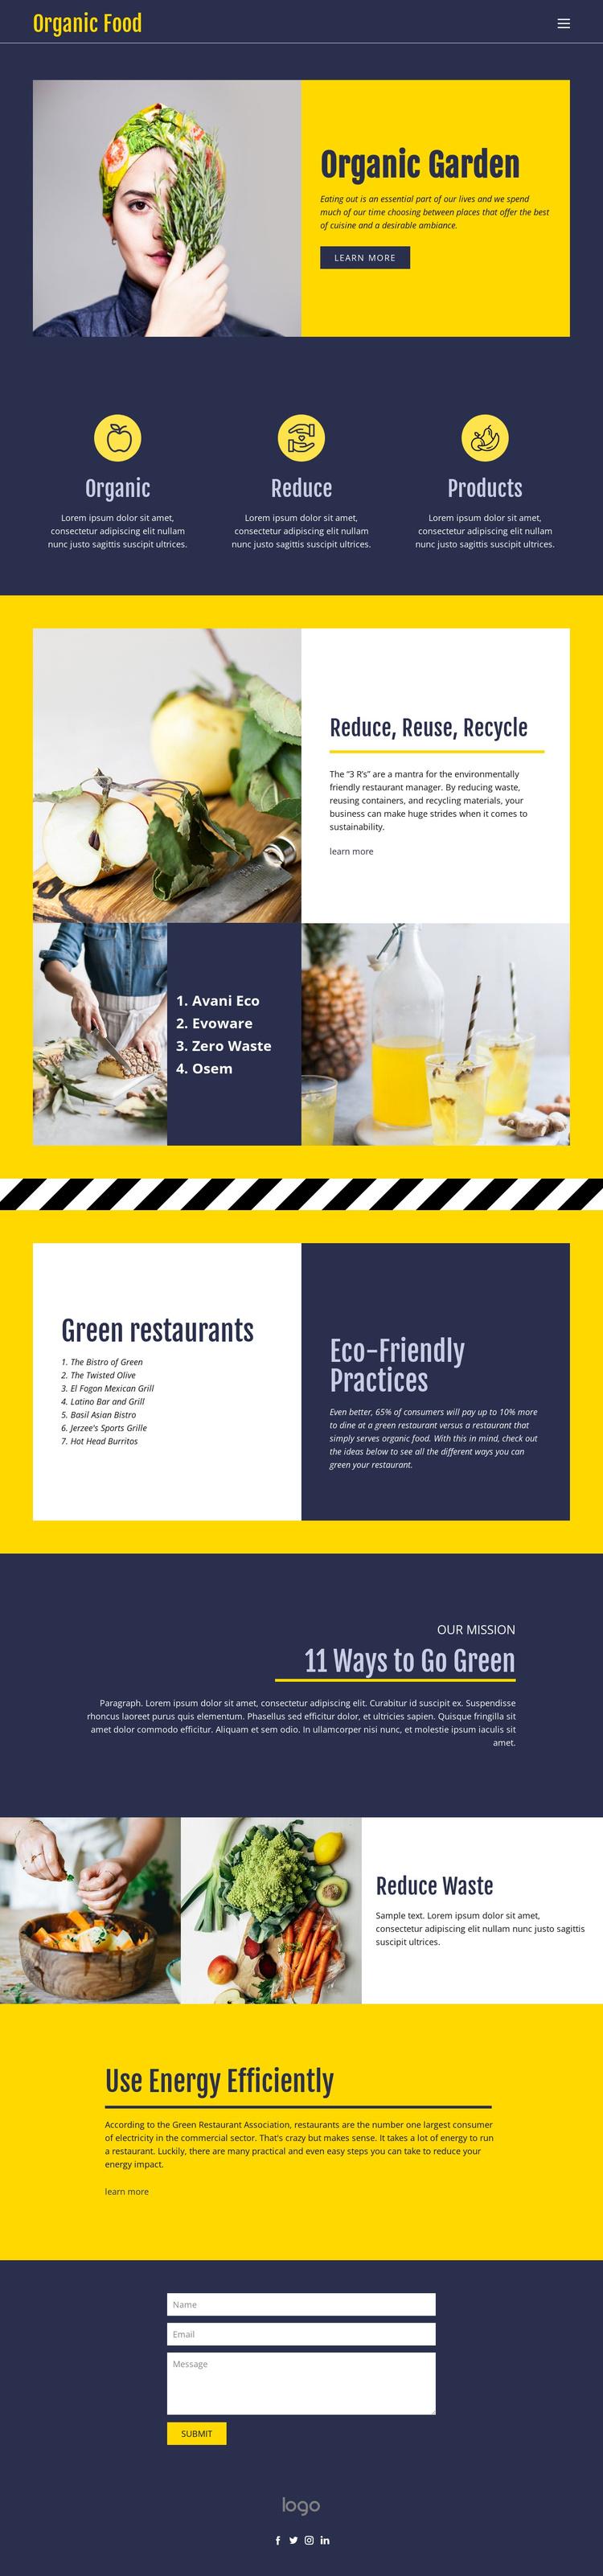 Eating essentials for food Joomla Template